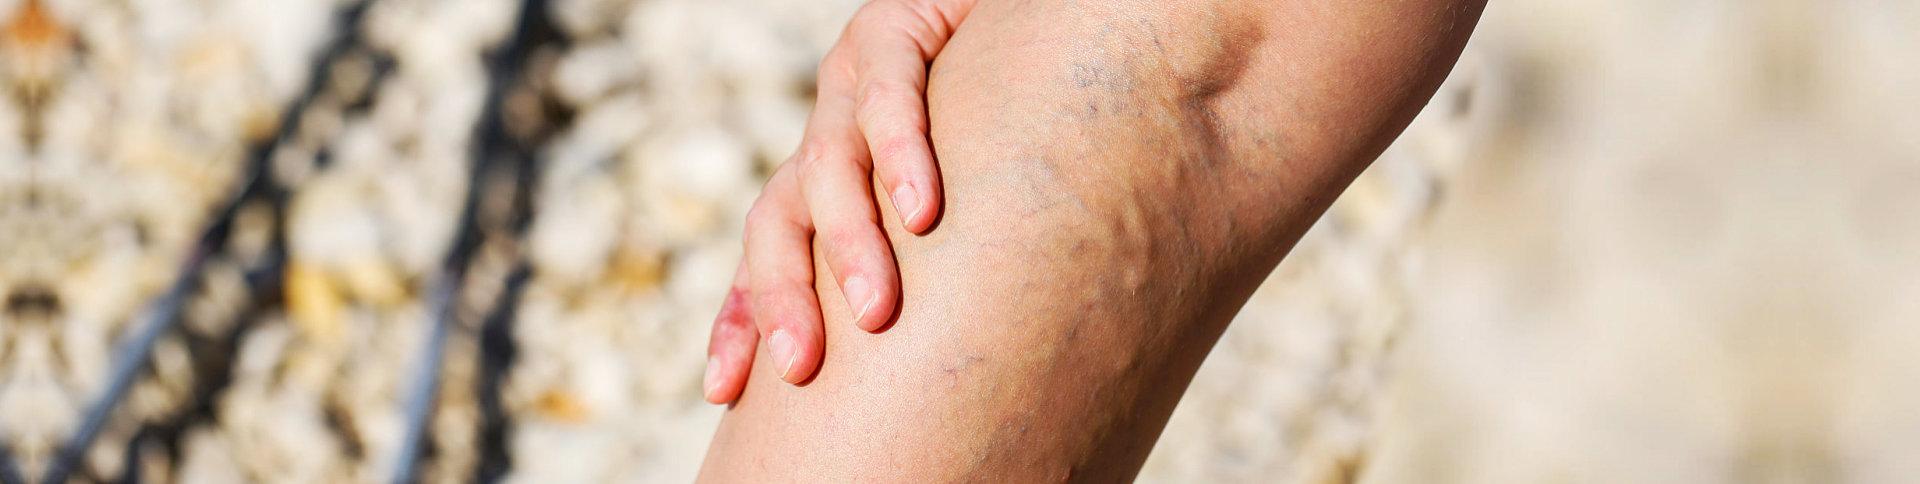 varicose at the leg